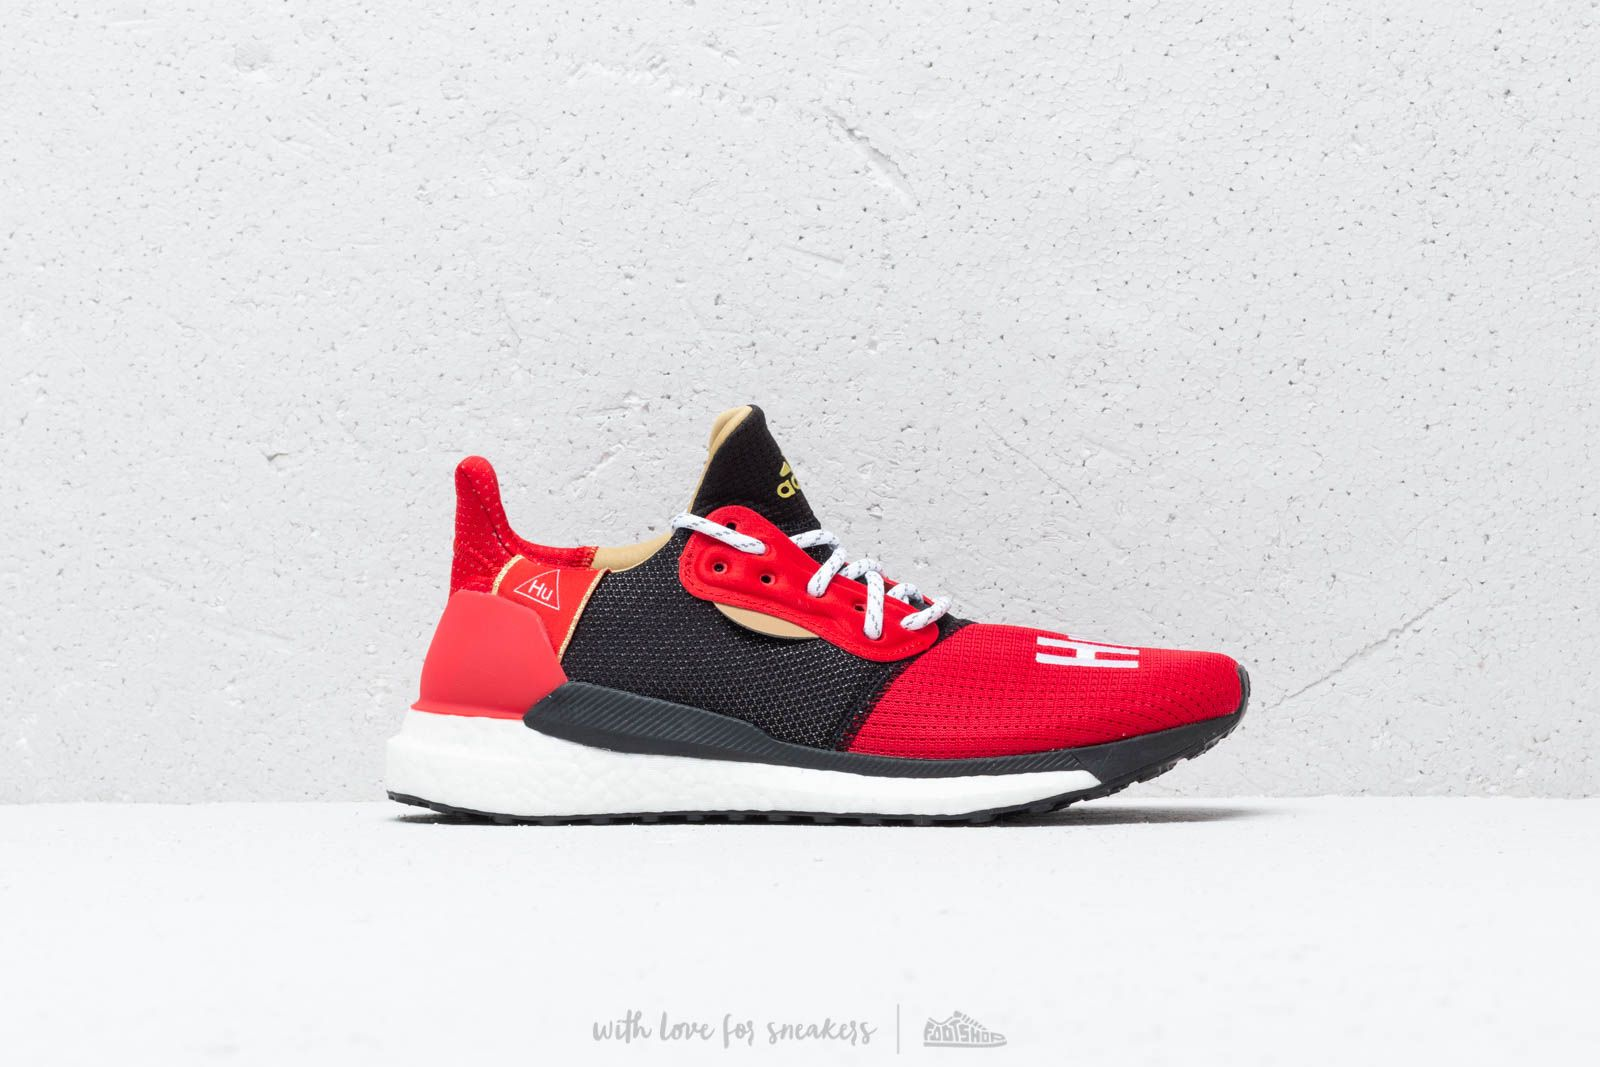 10148fa67ac26 adidas x Pharrell Williams Solar HU Glide CNY Red  Core Black at a great  price